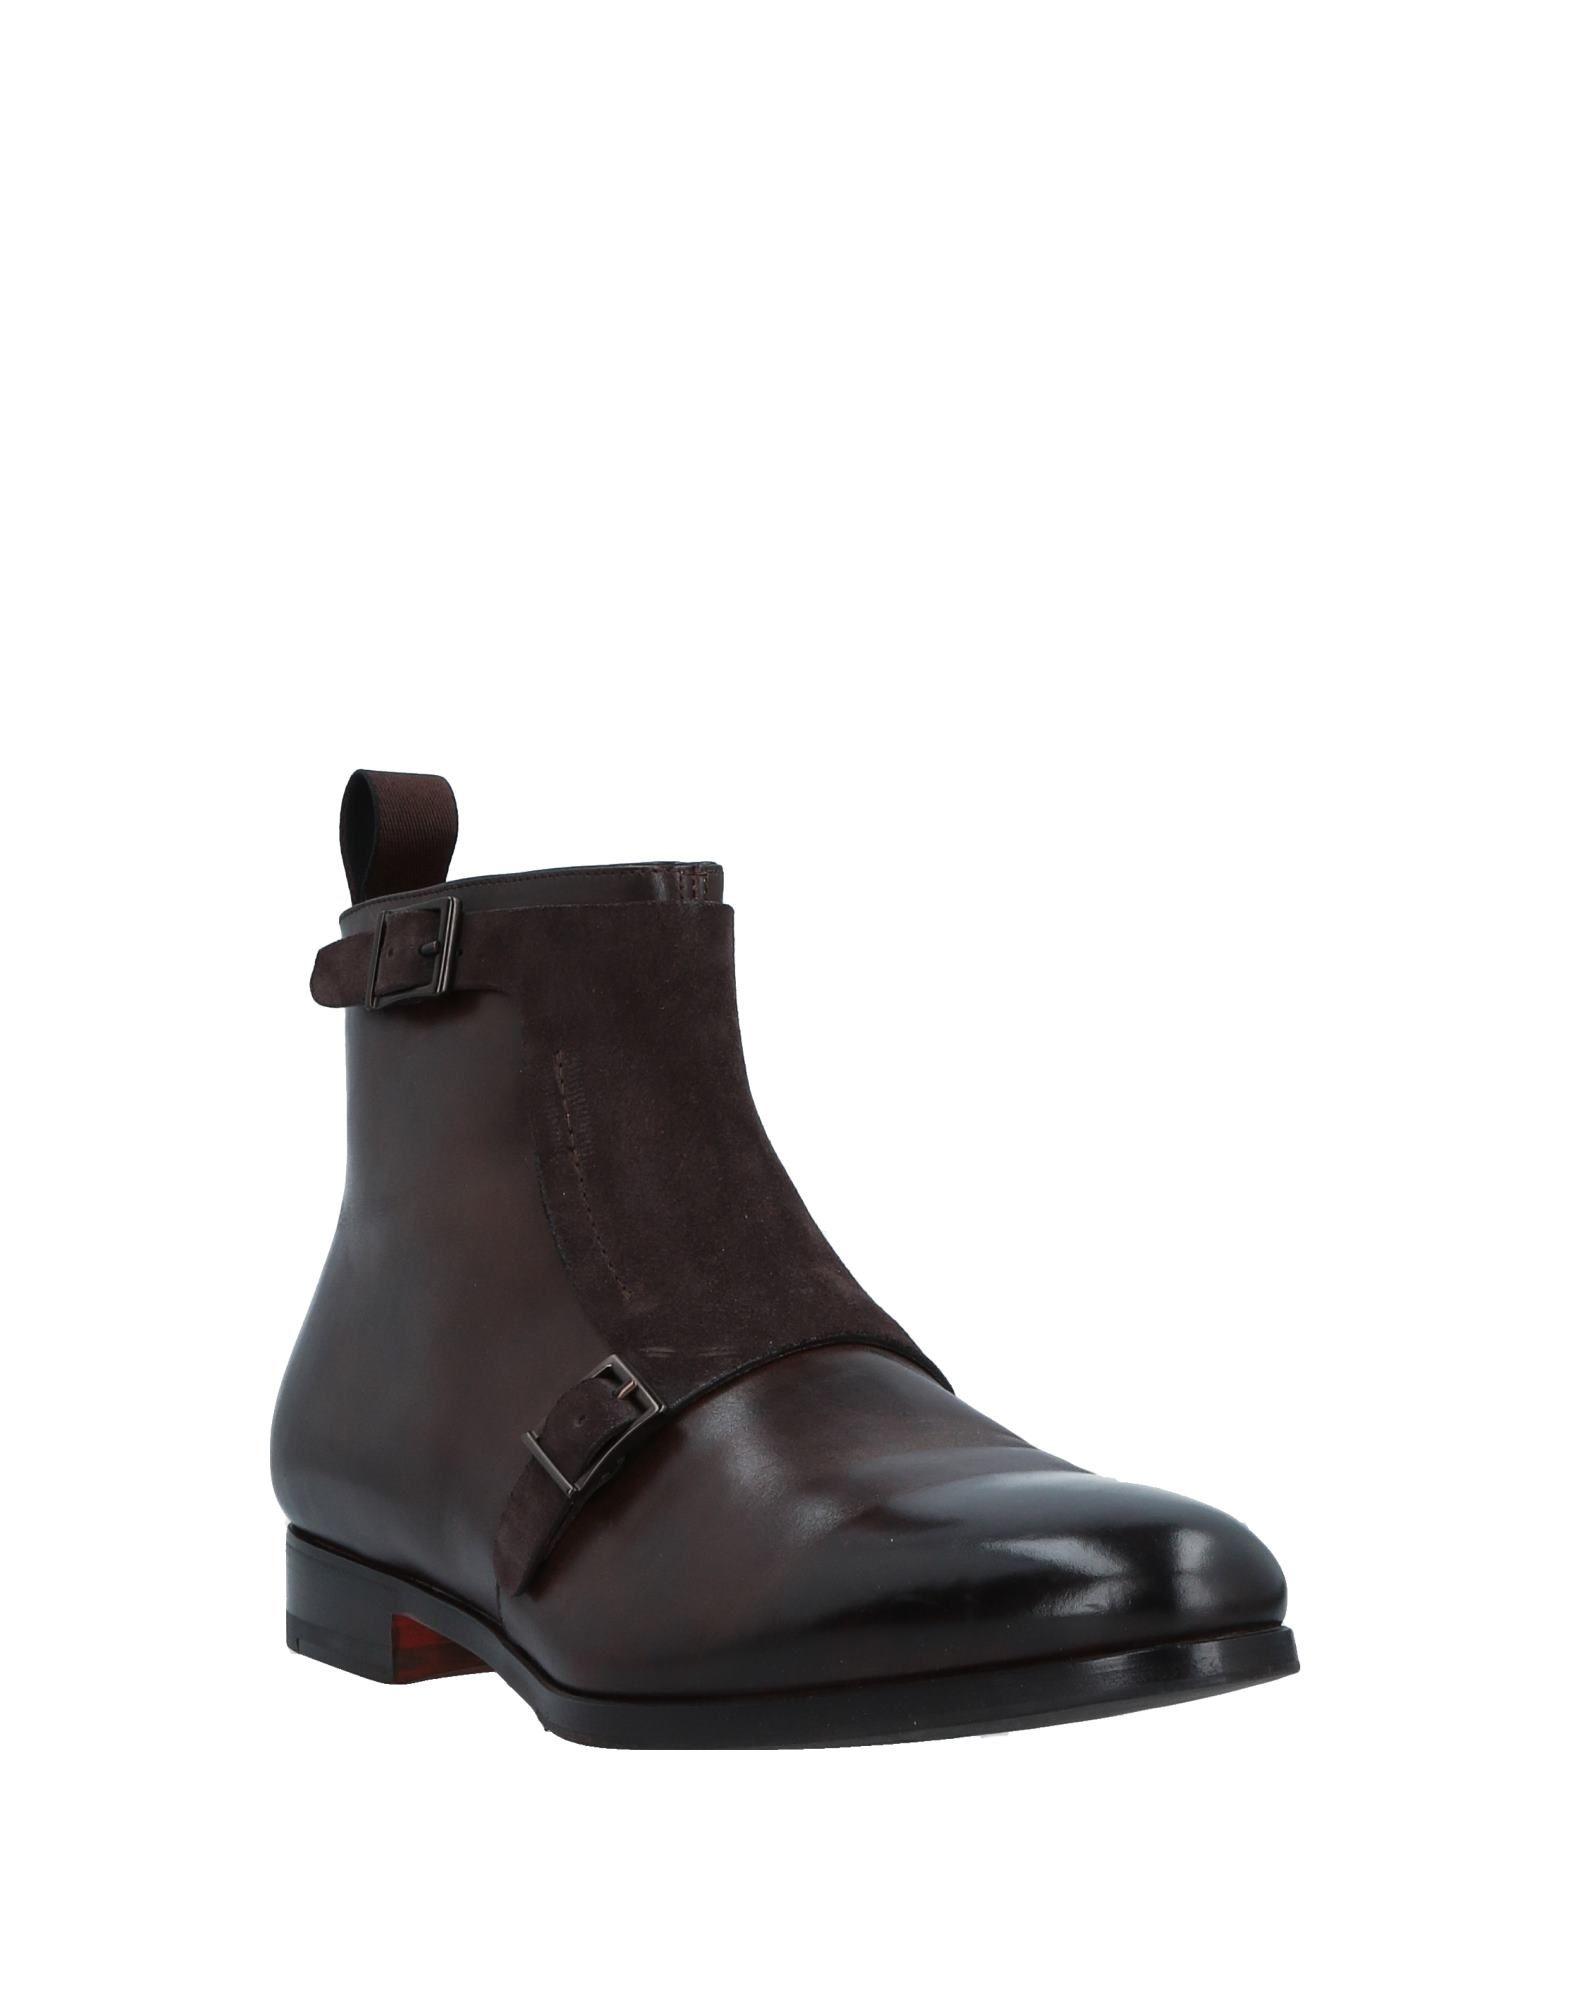 Santoni Stiefelette Herren  beliebte 11519773JK Gute Qualität beliebte  Schuhe 656cff